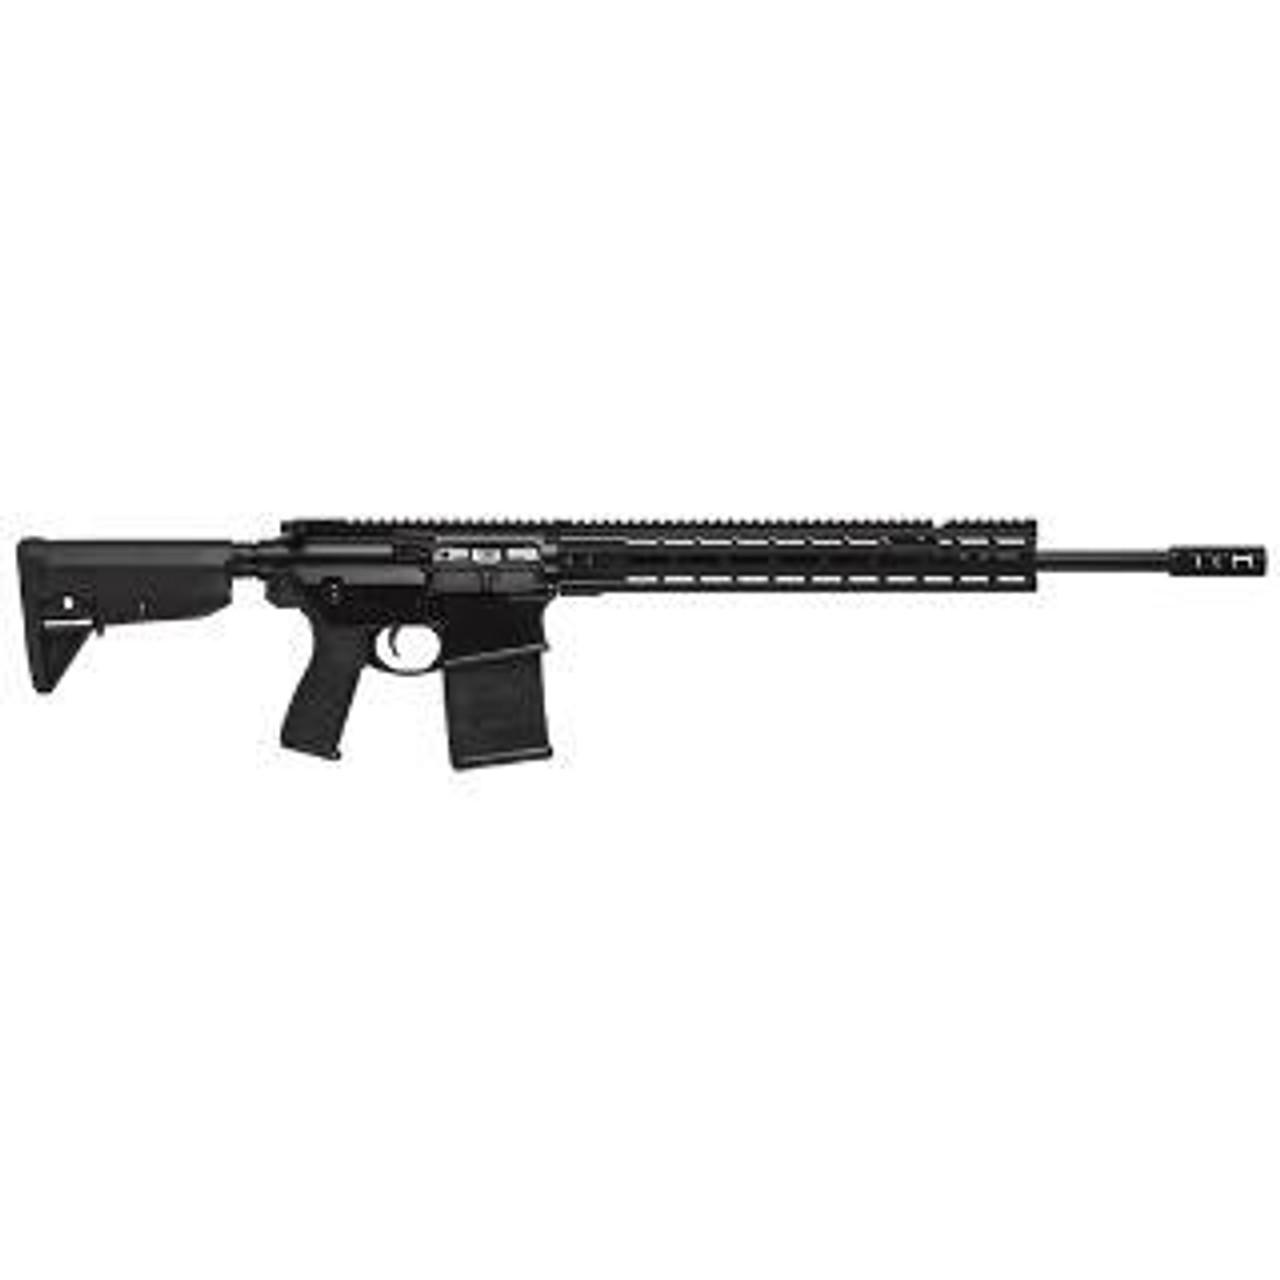 PWS MK2 MOD1  20inch CALIFORNIA LEGAL - .308/7.62x51